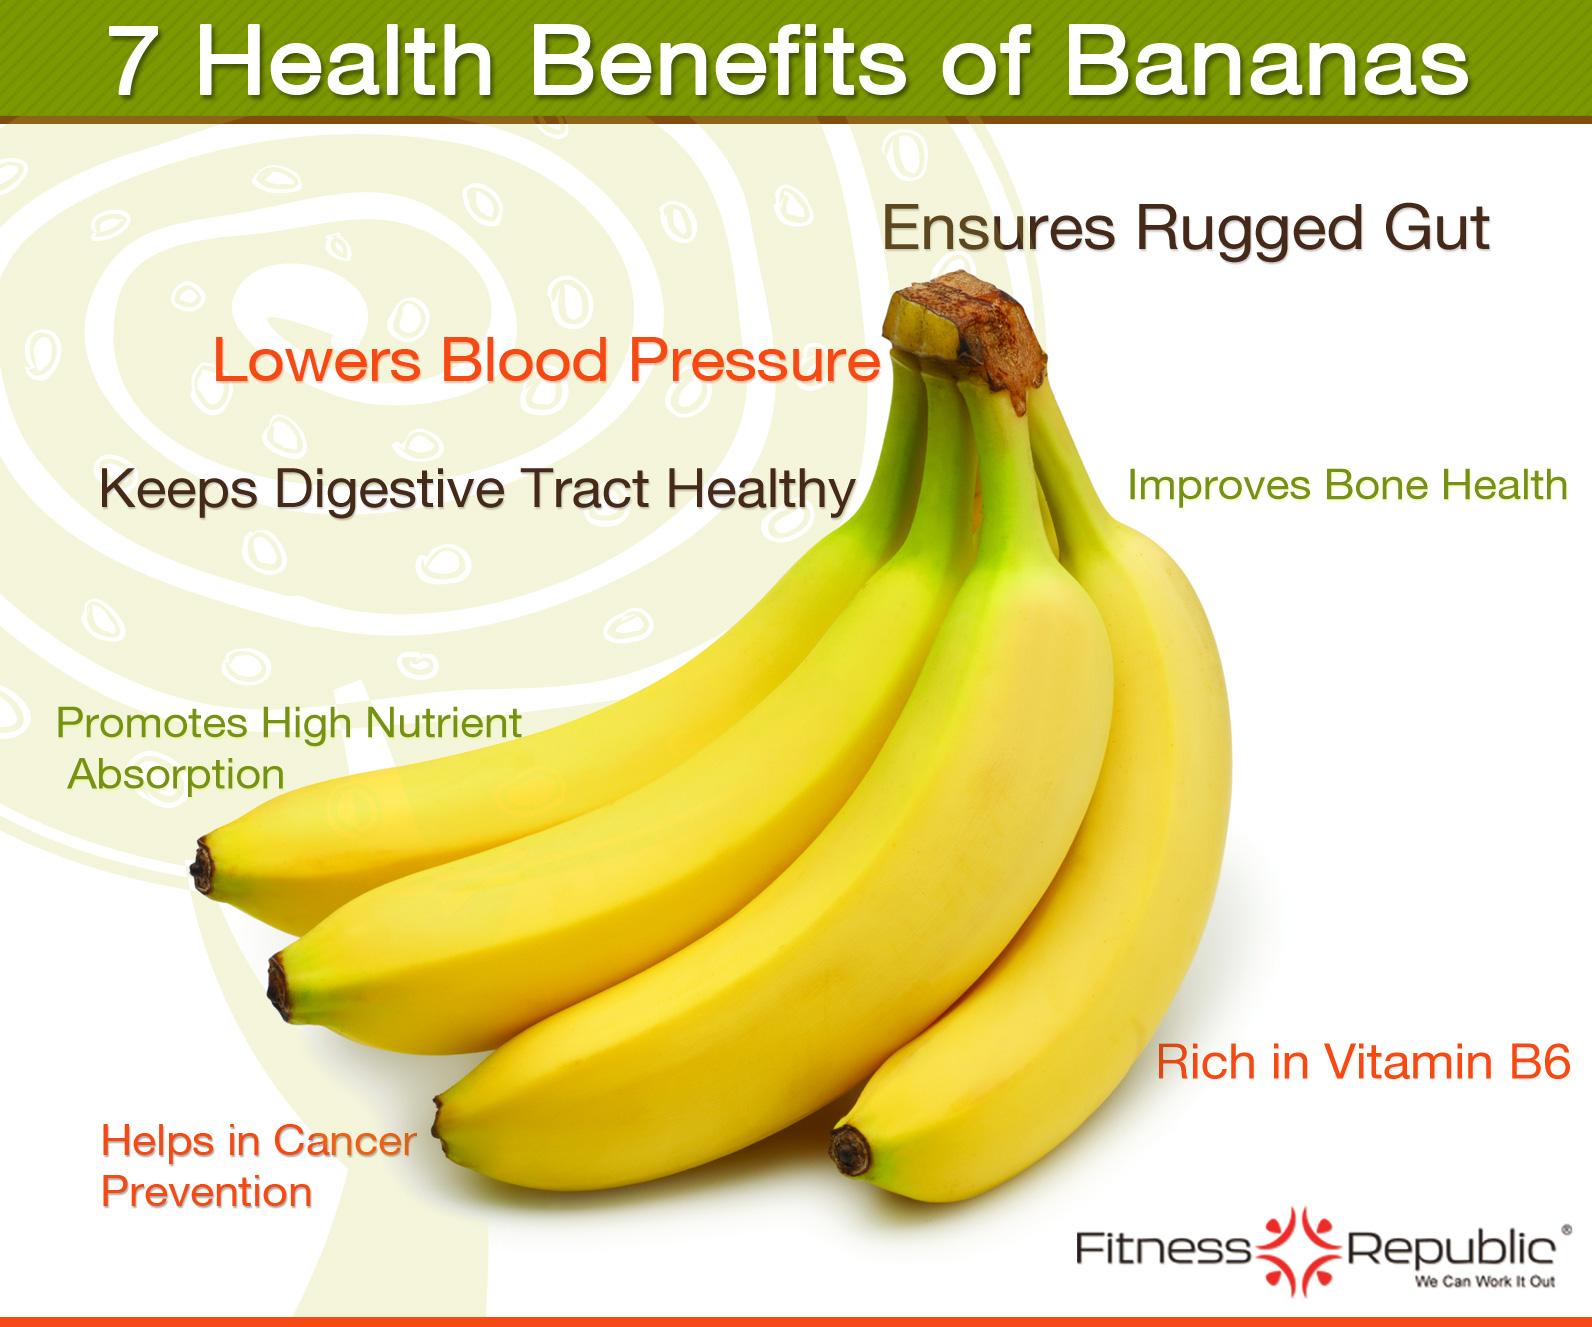 health-benefits-of-bananas_525b9547e6af3